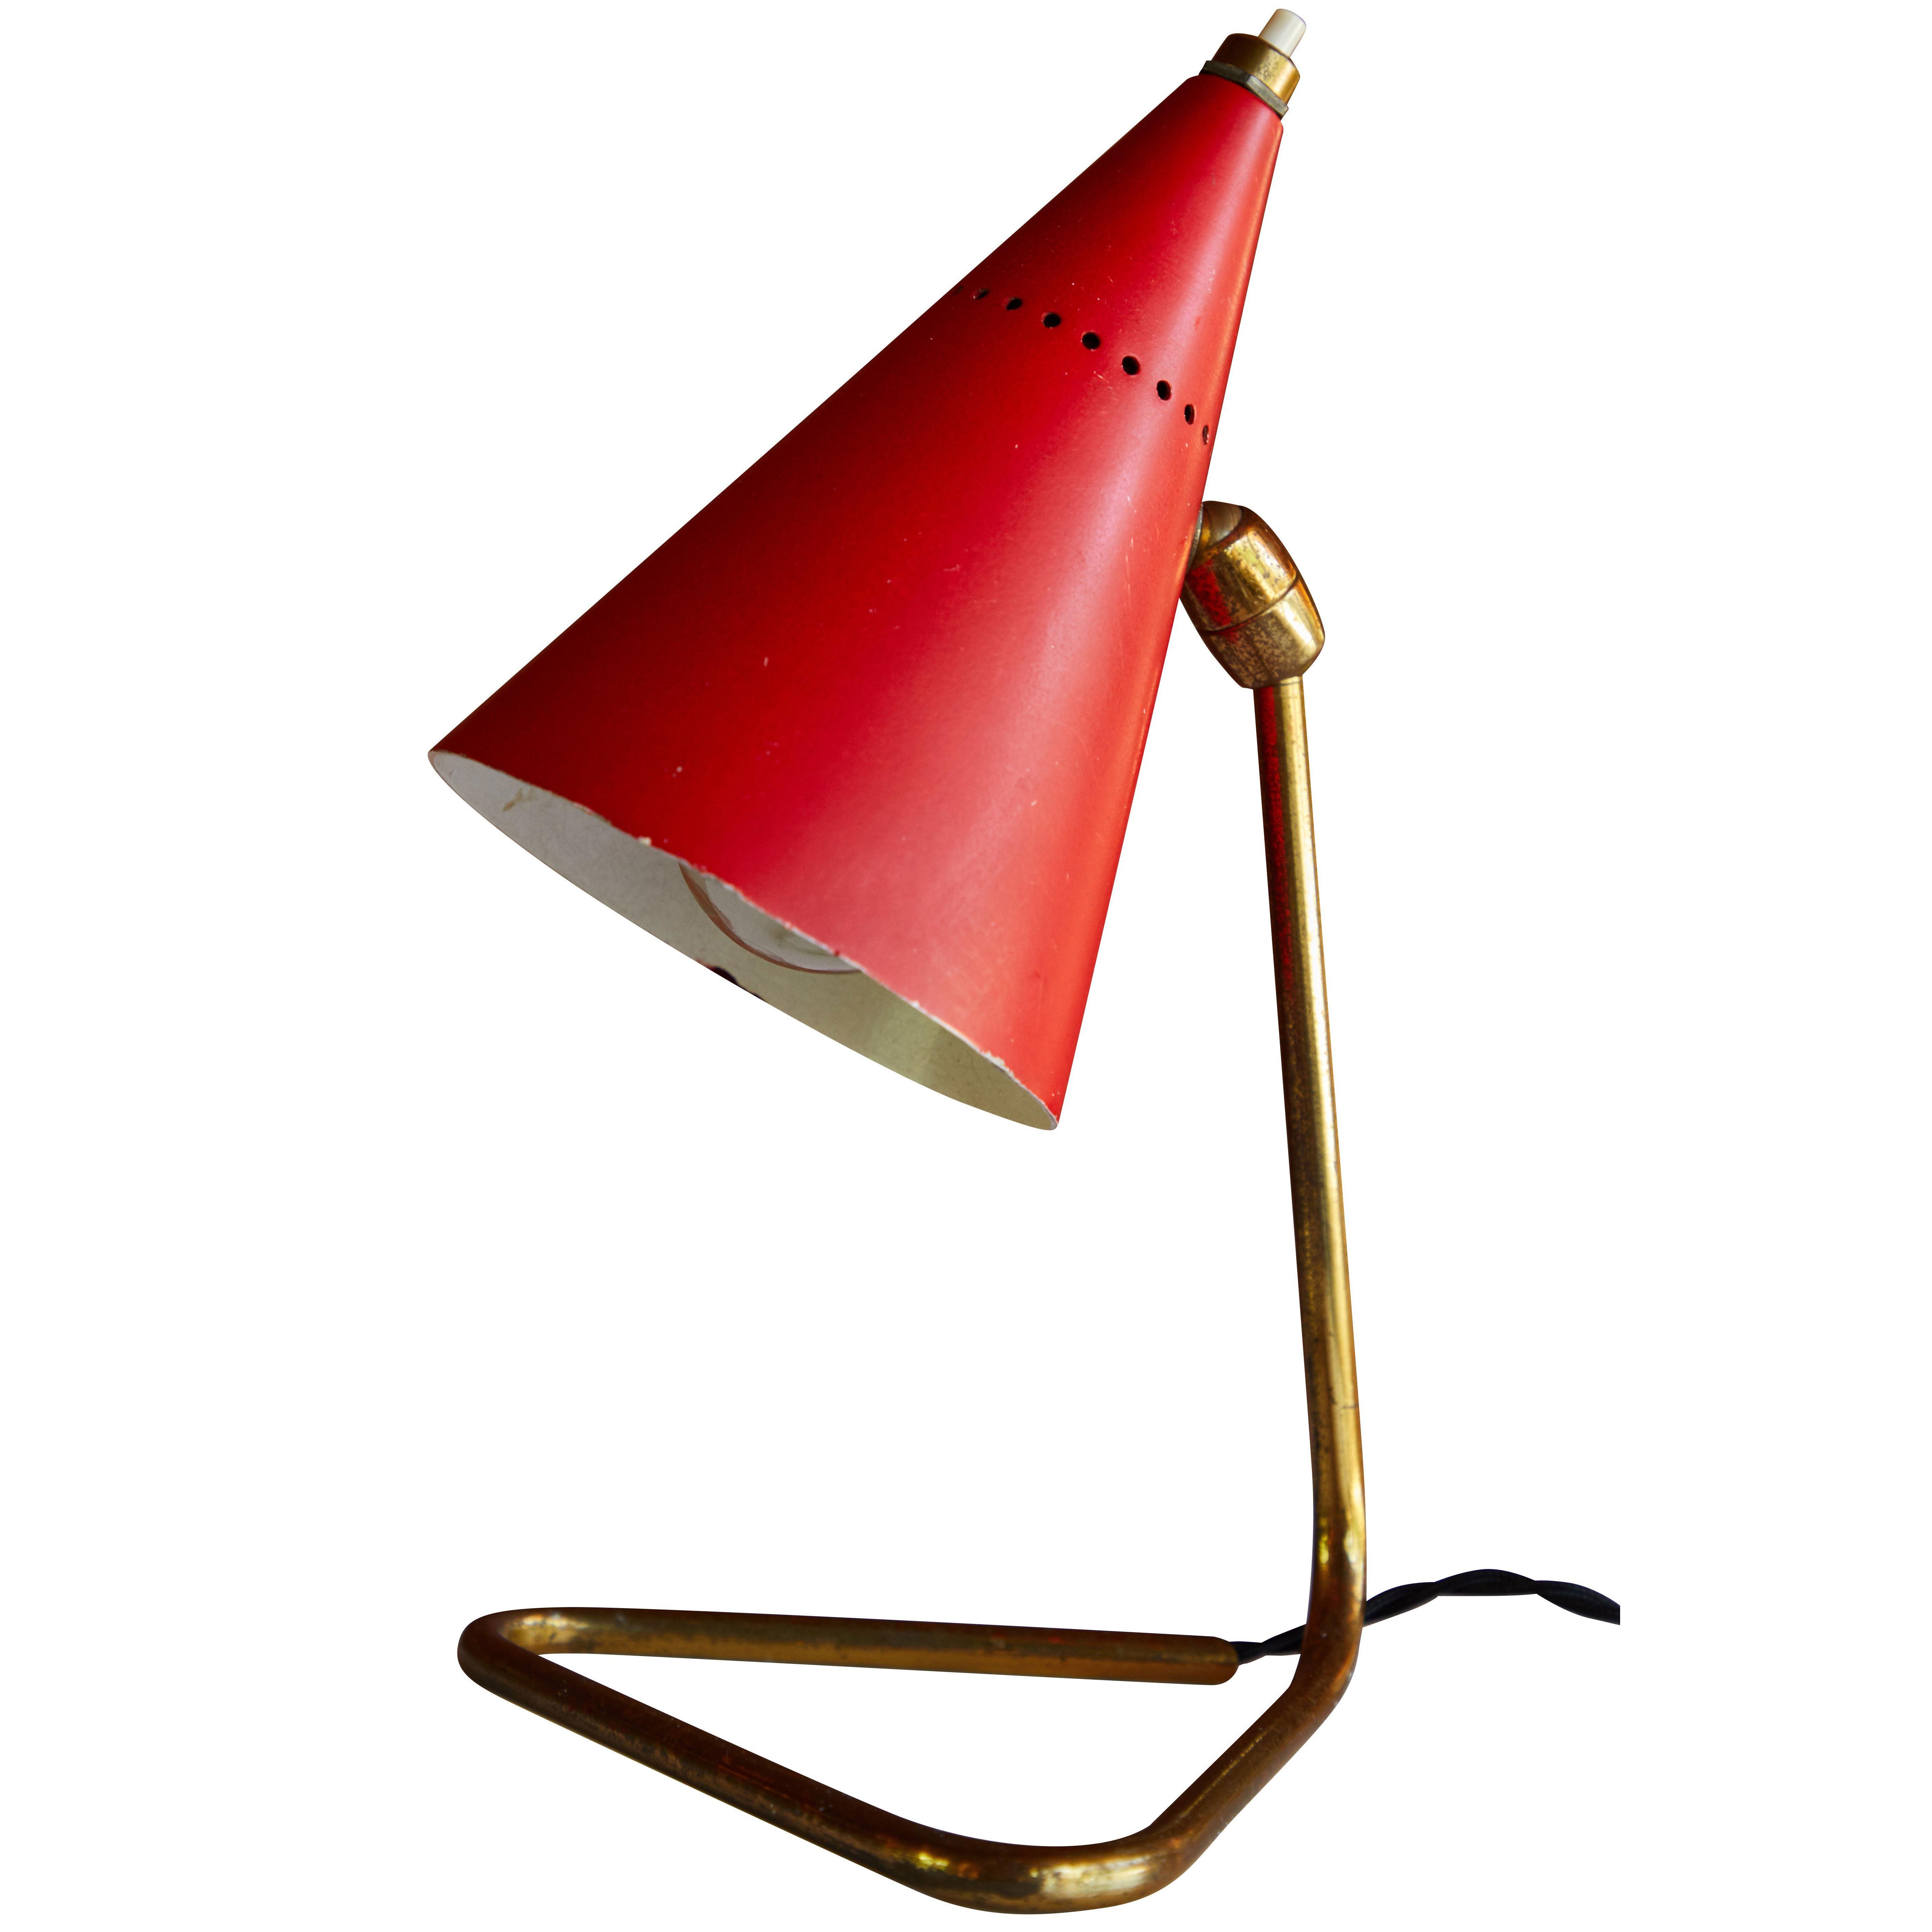 1950s Giuseppe Ostuni Red Cone Table Lamp for Oluce